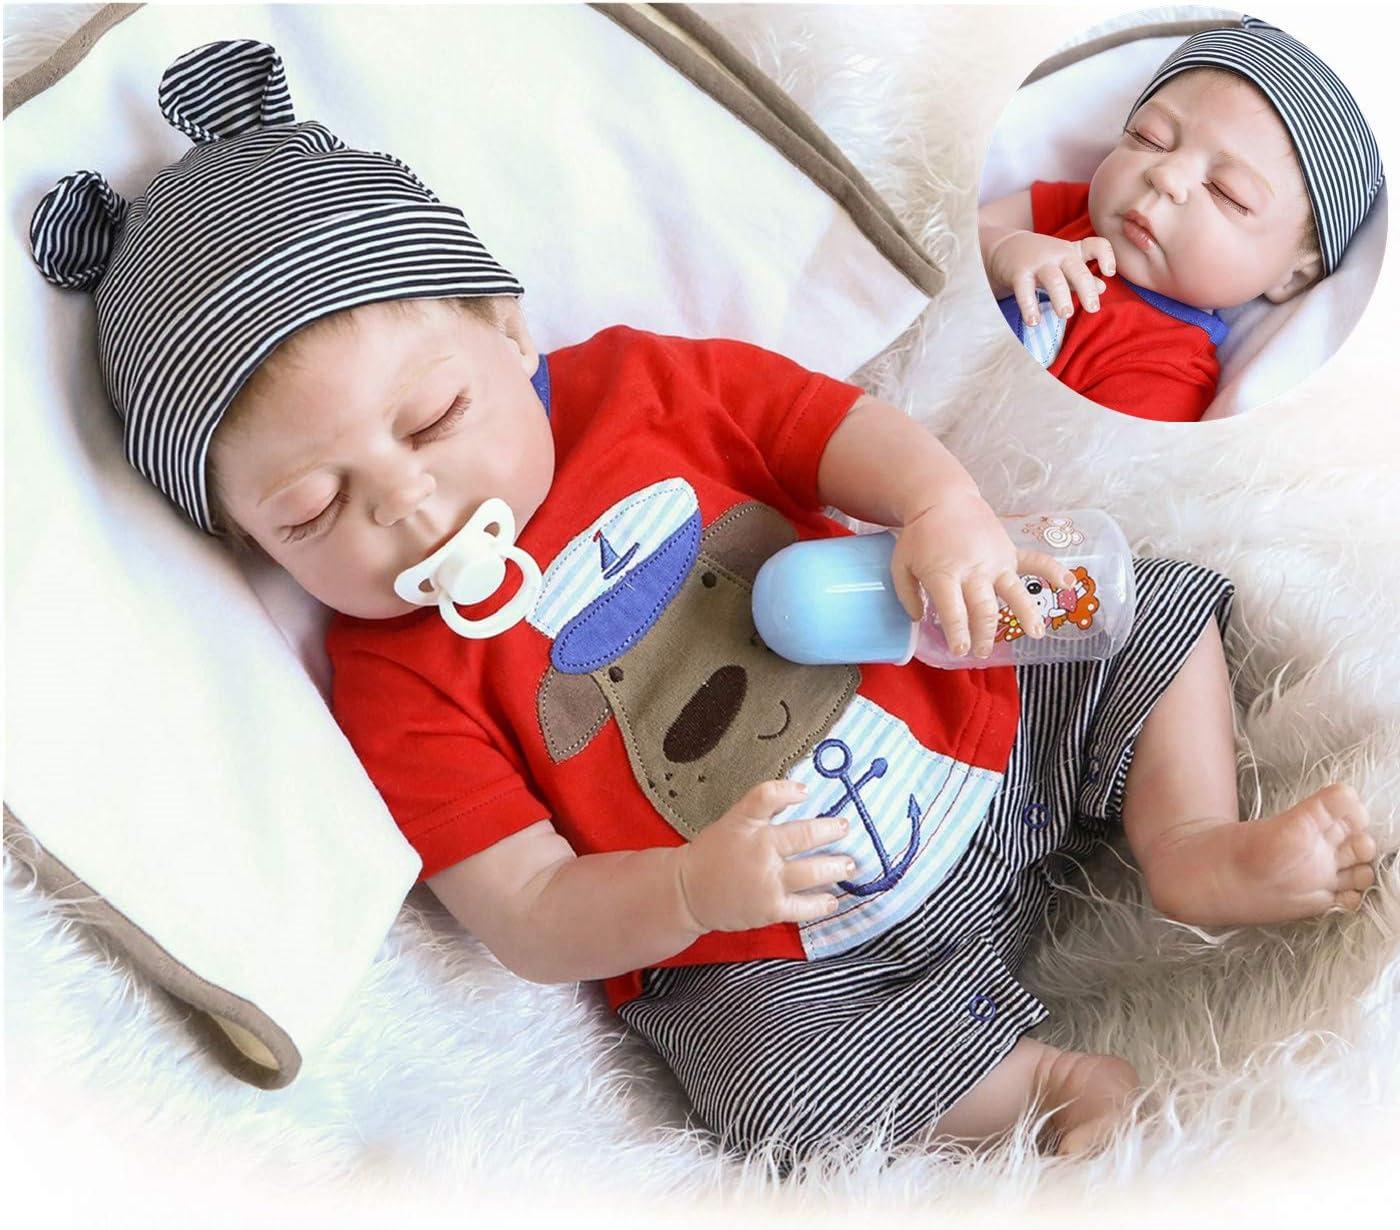 Reborn Max 40% OFF Baby Dolls Boys Sleeping 22 Award Inch Silicone Full Body Vinyl